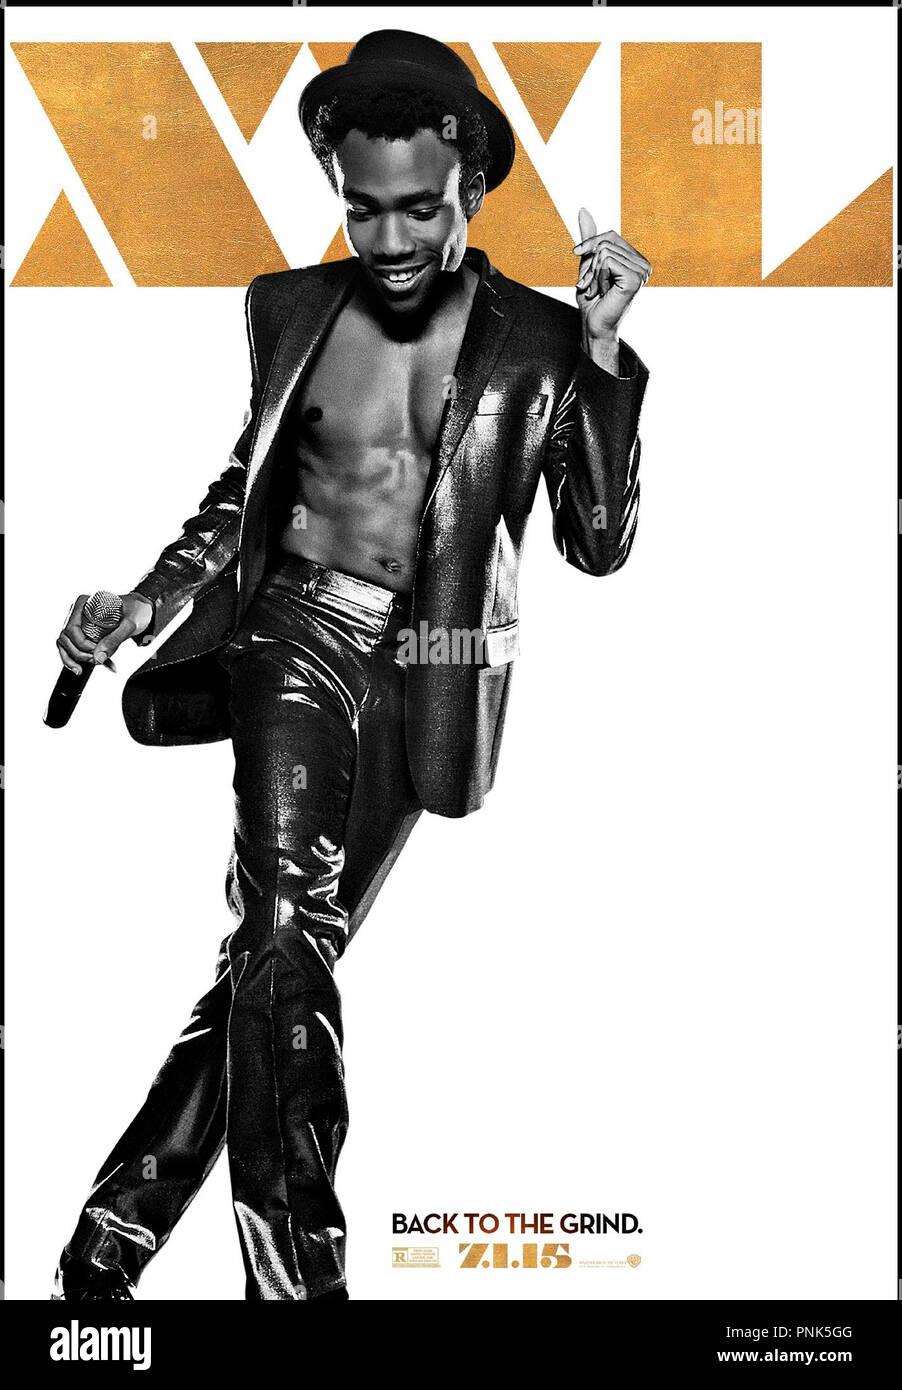 Prod DB © Warner Bros. - Iron Horse Entertainment / DR MAGIC MIKE XXL de Gregory Jacobs 2015 USA teaser americain avec Donald Glover  suite, sequelle, strip teaseur - Stock Image